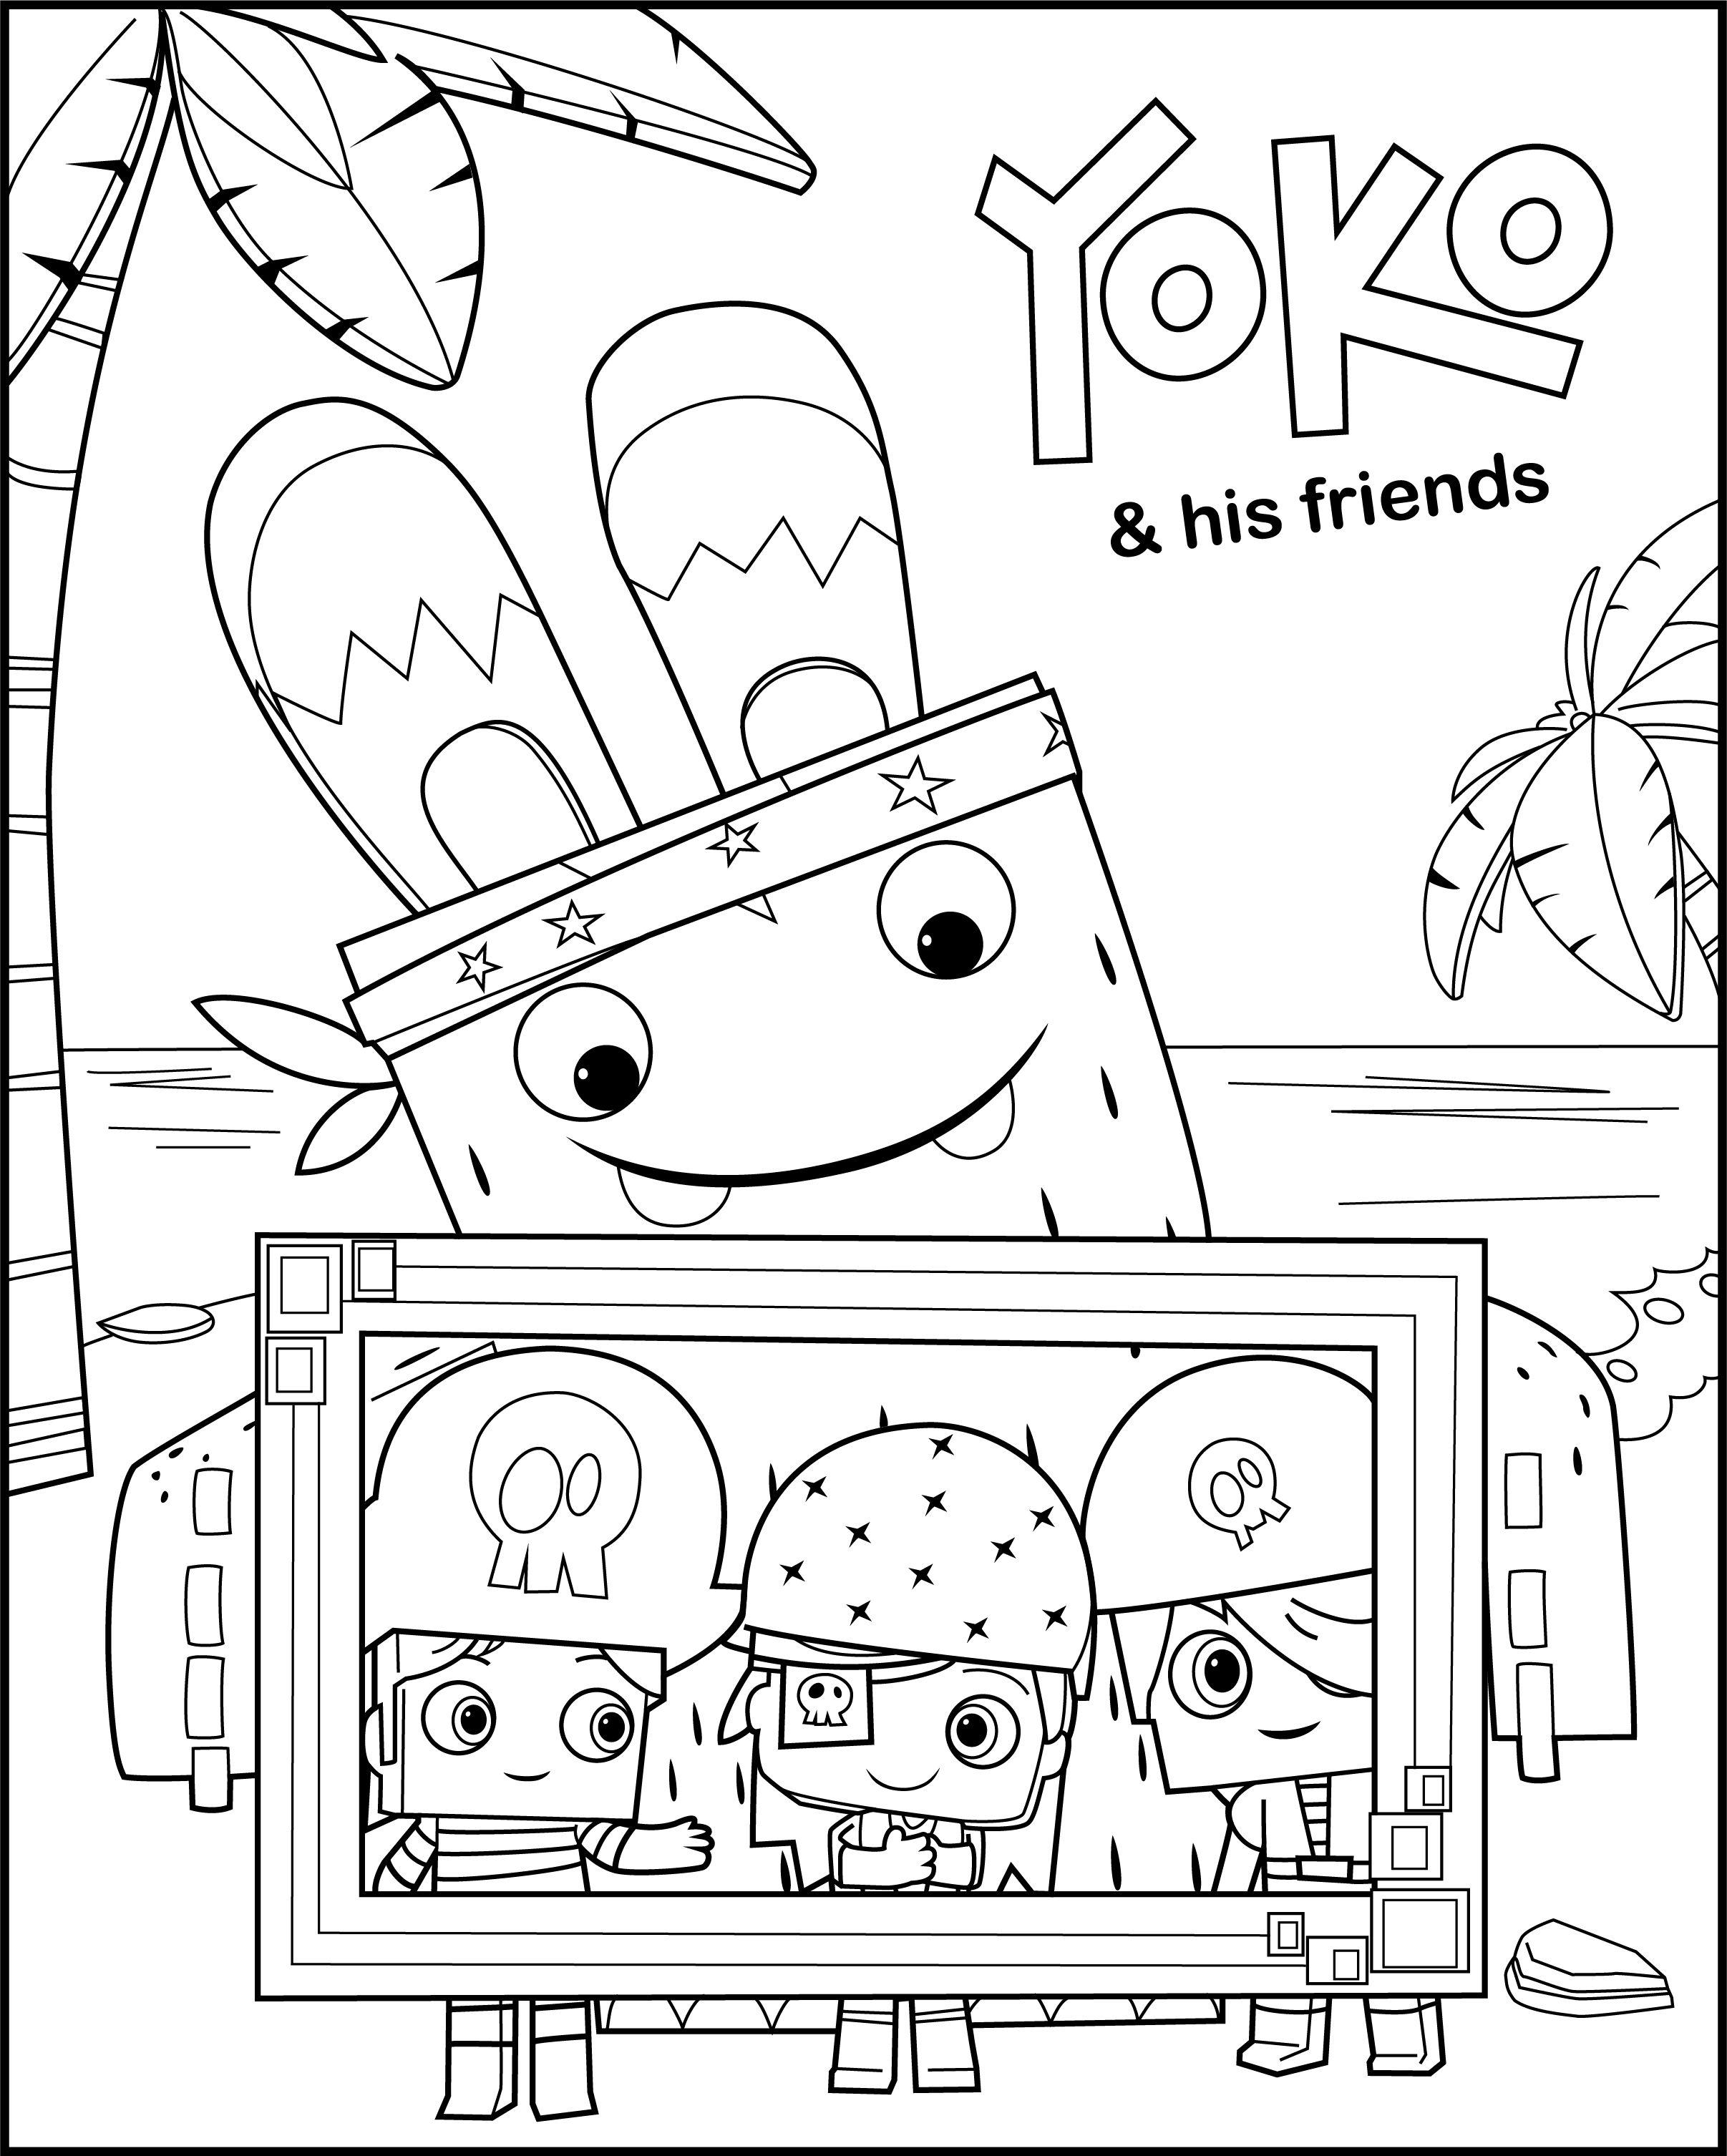 Yoko Netflix Yokoandfriends Coloringpages Preschool Coloring Pages Curious George Coloring Pages Coloring Pages Inspirational